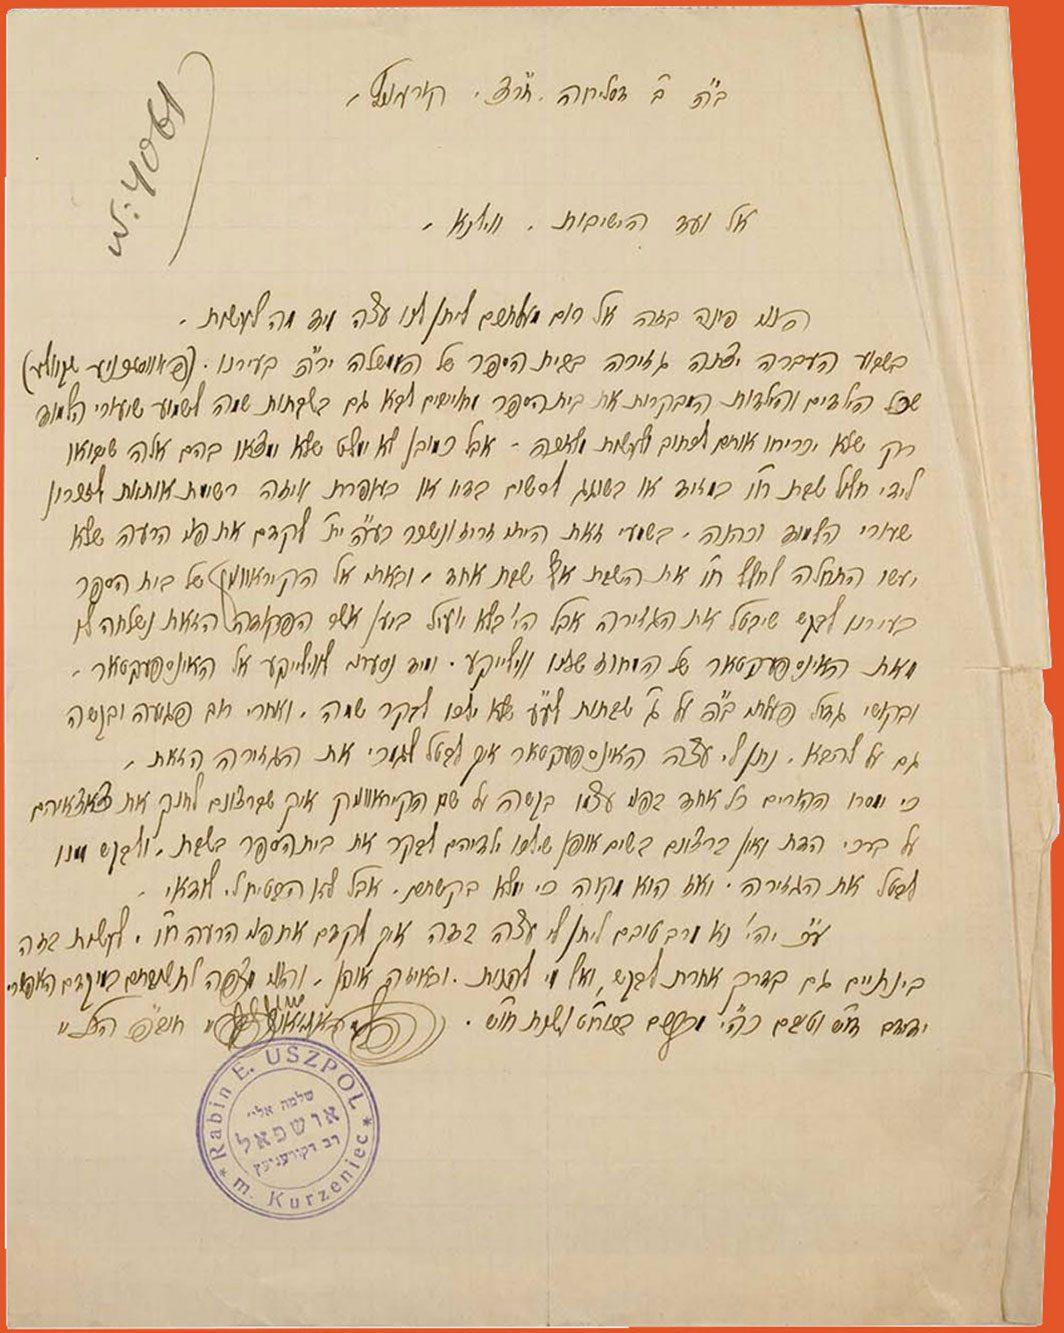 Handwritten letter in Yiddish asking for advice